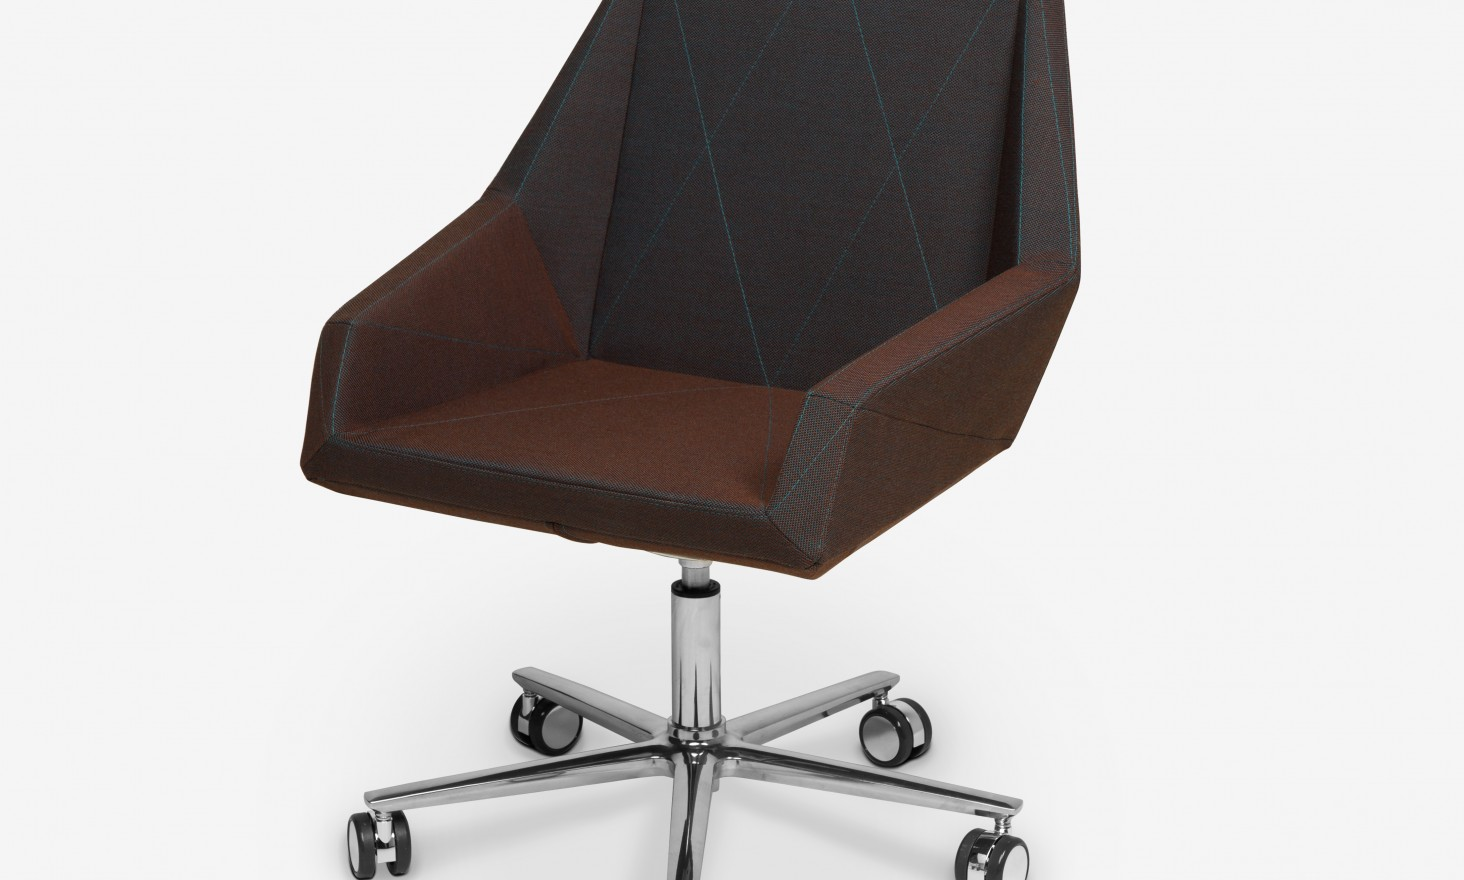 PRISM_chair_five_wheel_base_packshot